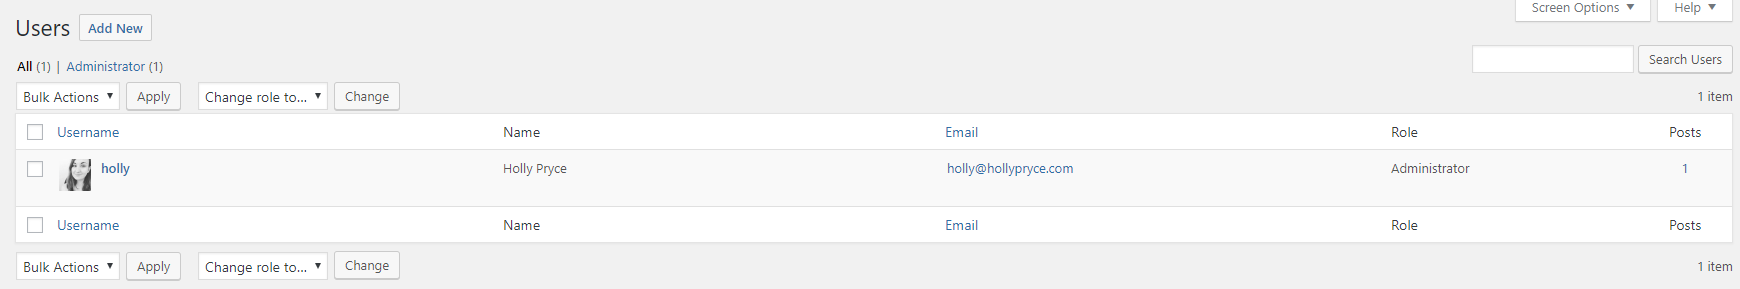 List of users in WordPress | HollyPryce.com